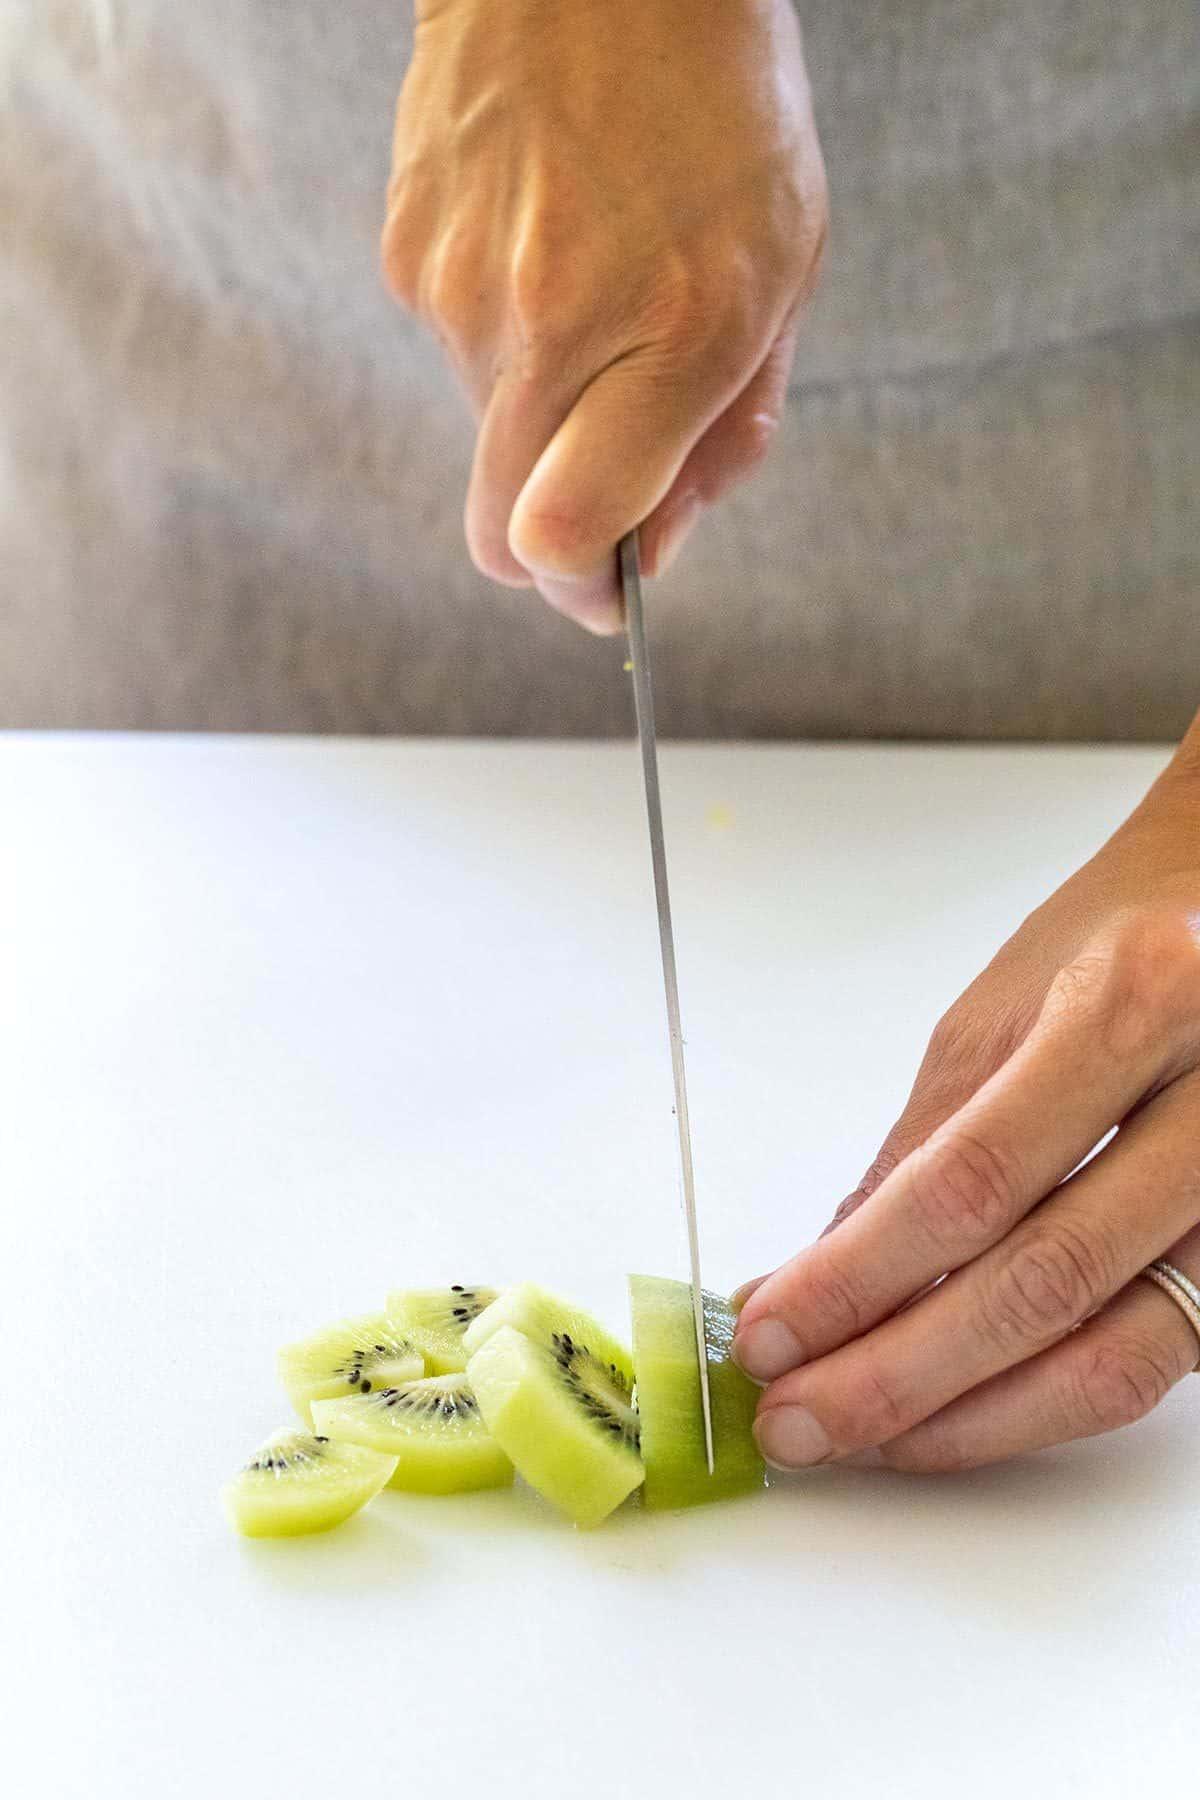 slicing kiwi on a cutting board